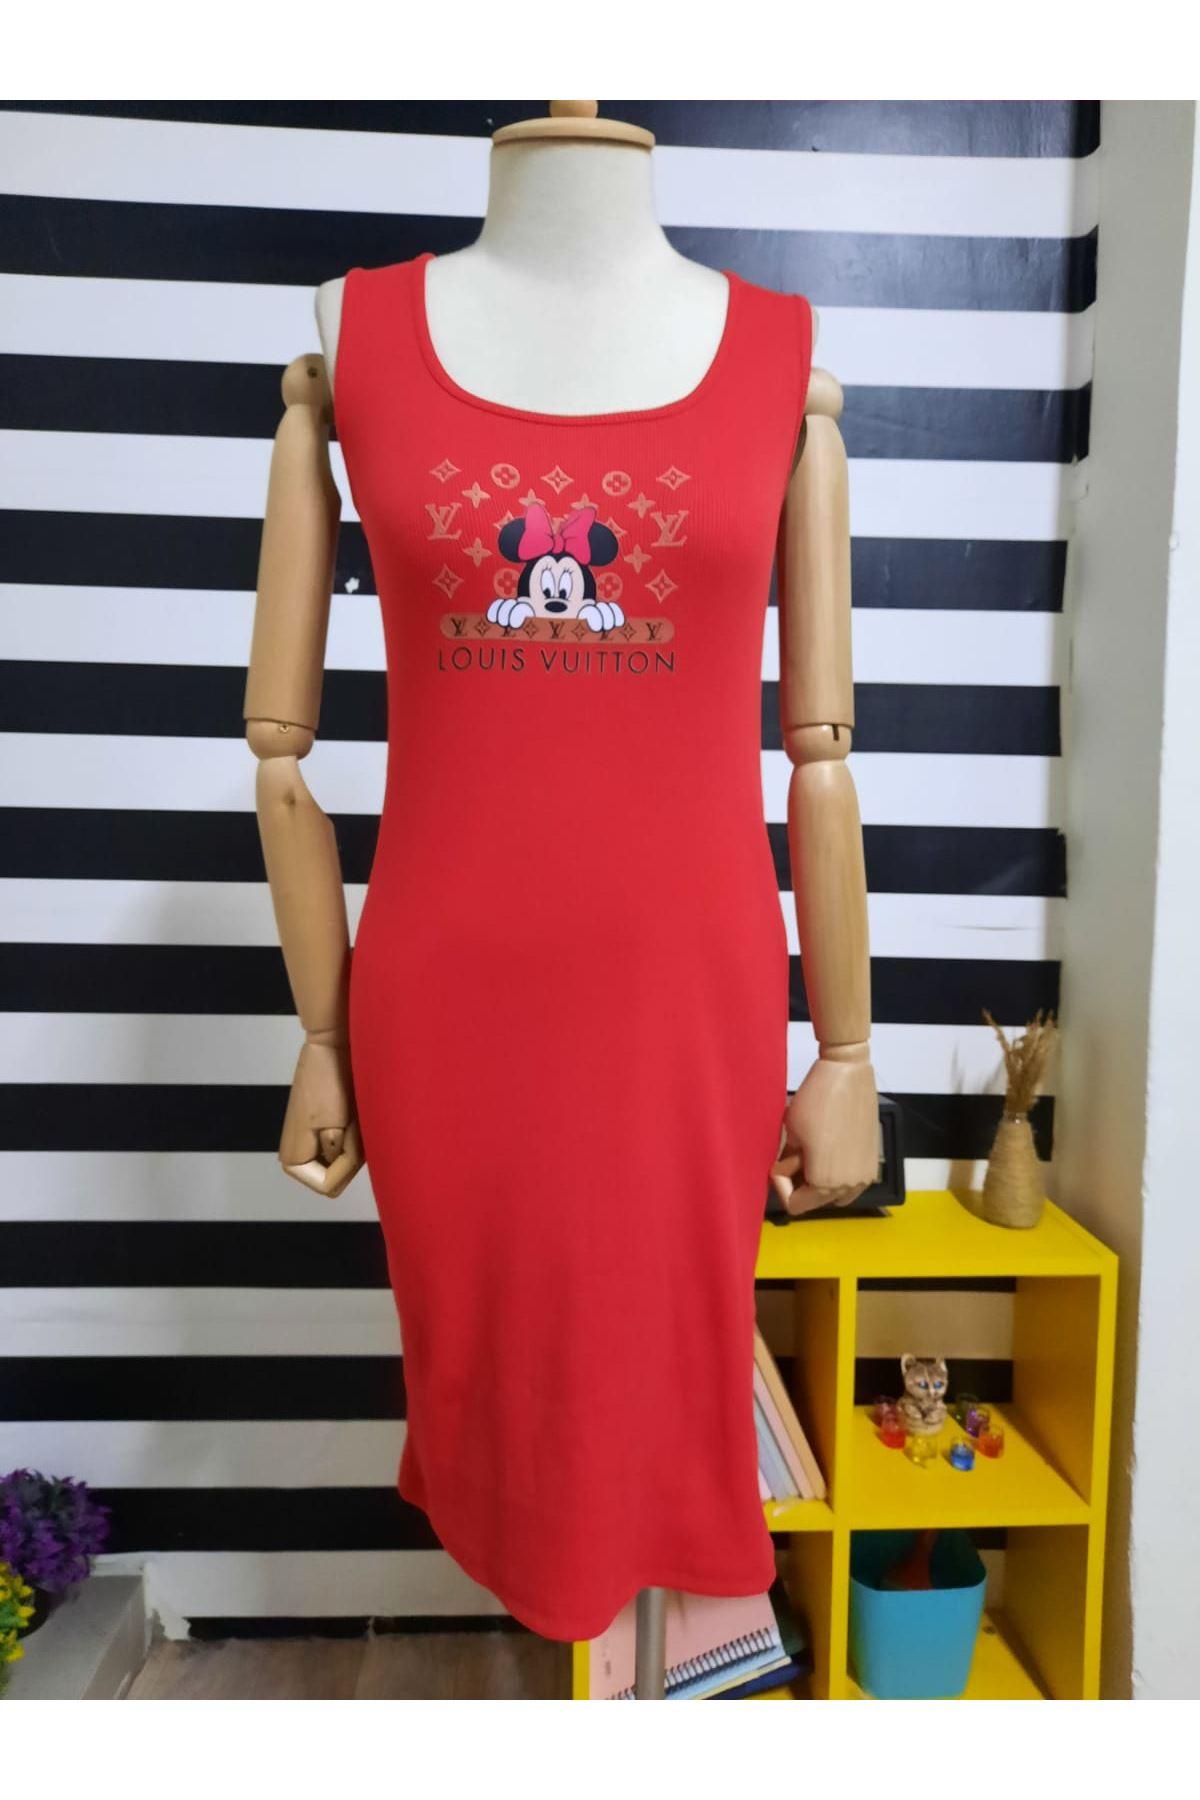 LV Model Kaşkorse Elbise - KIRMIZI